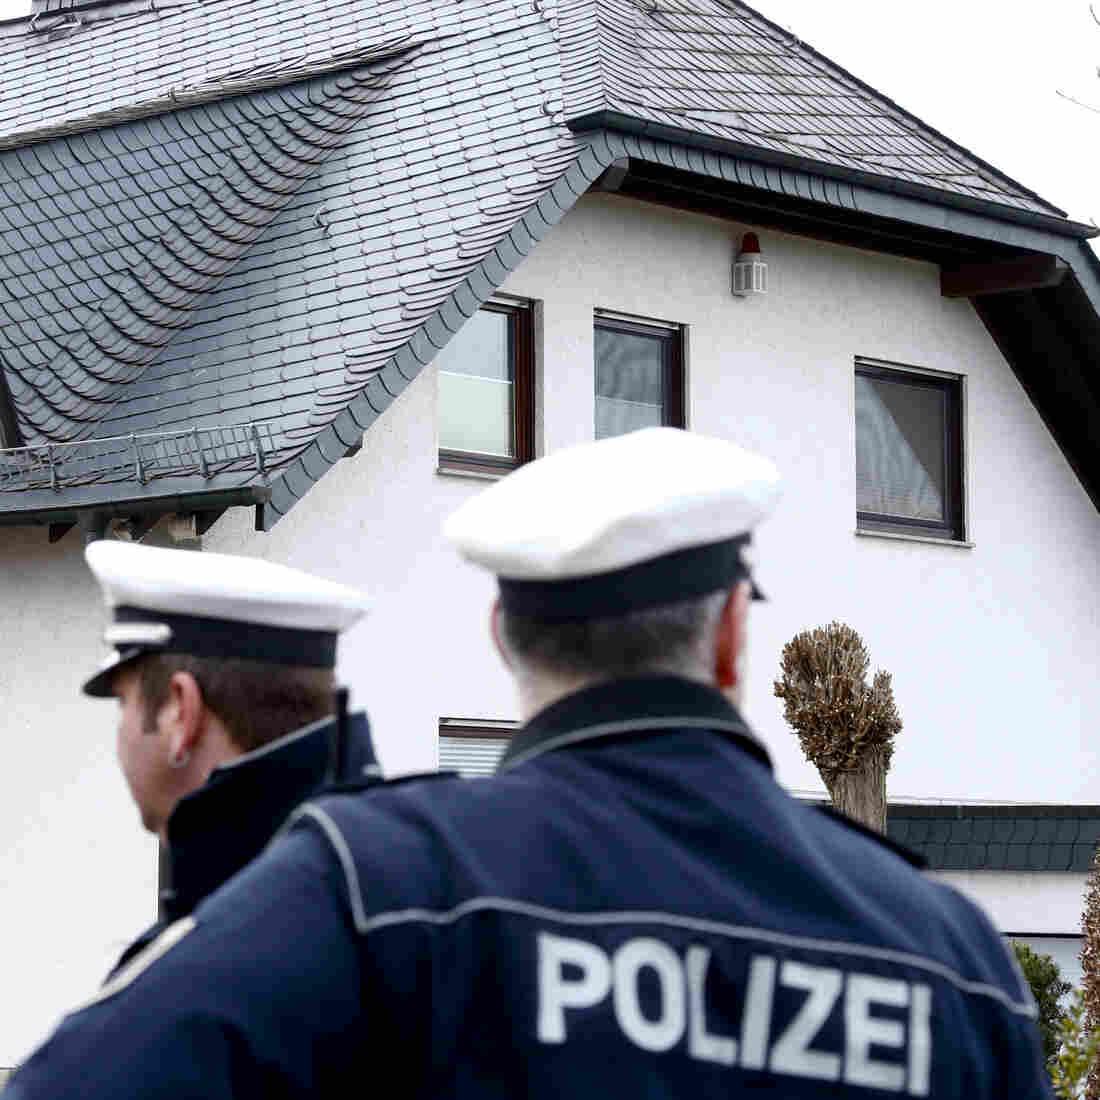 Details Emerge About Germanwings Co-Pilot Andreas Lubitz